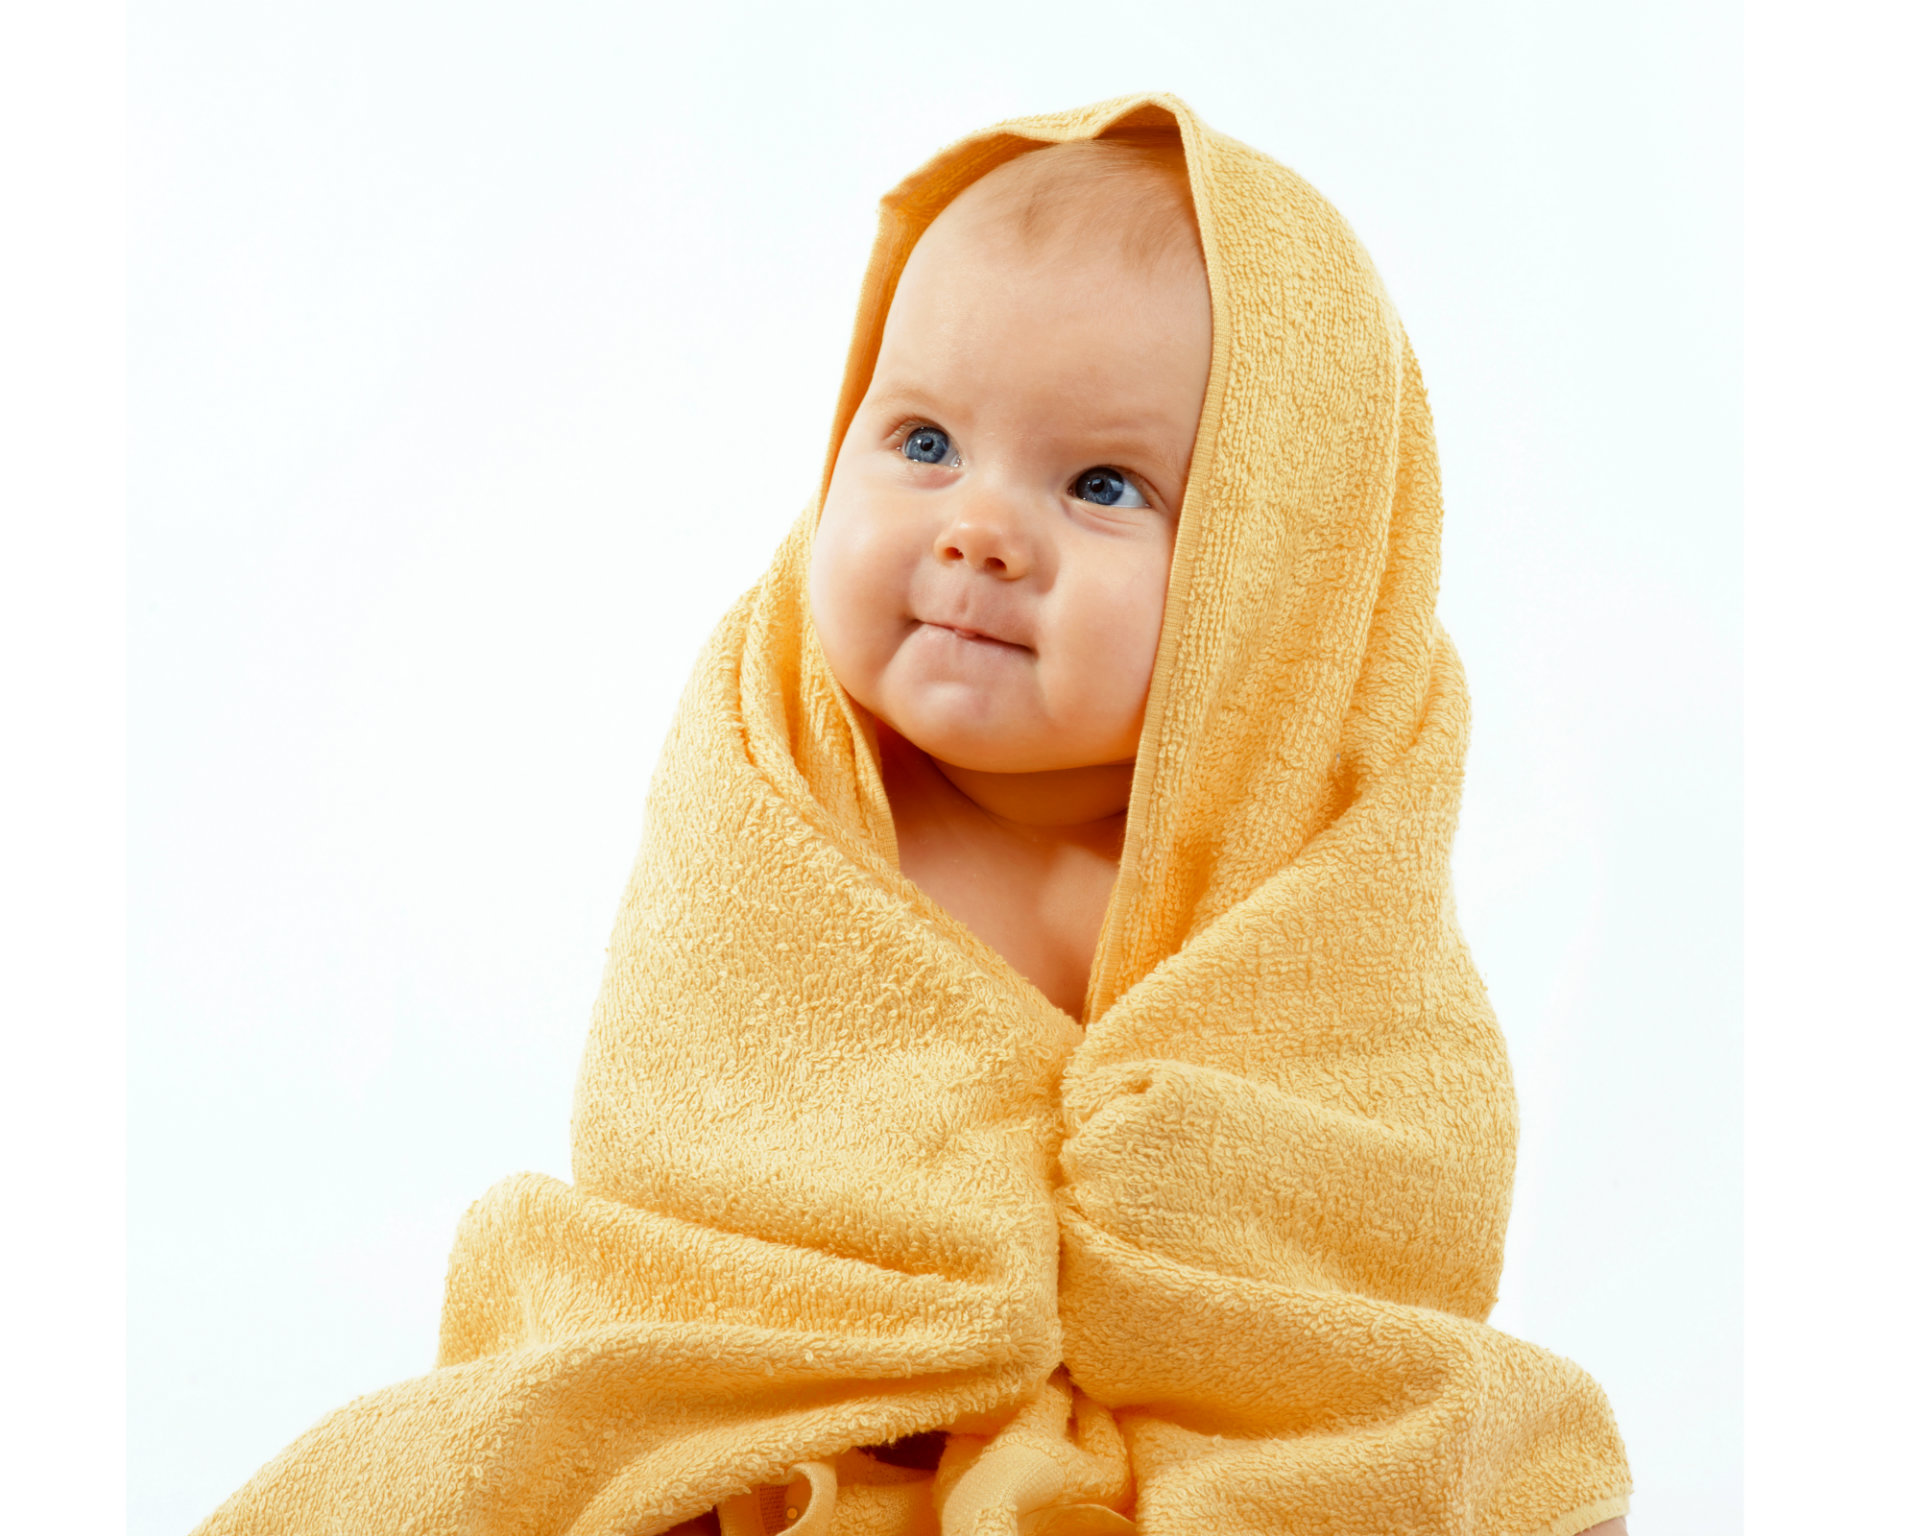 [19+] Cute Baby Boy HD Wallpapers on WallpaperSafari